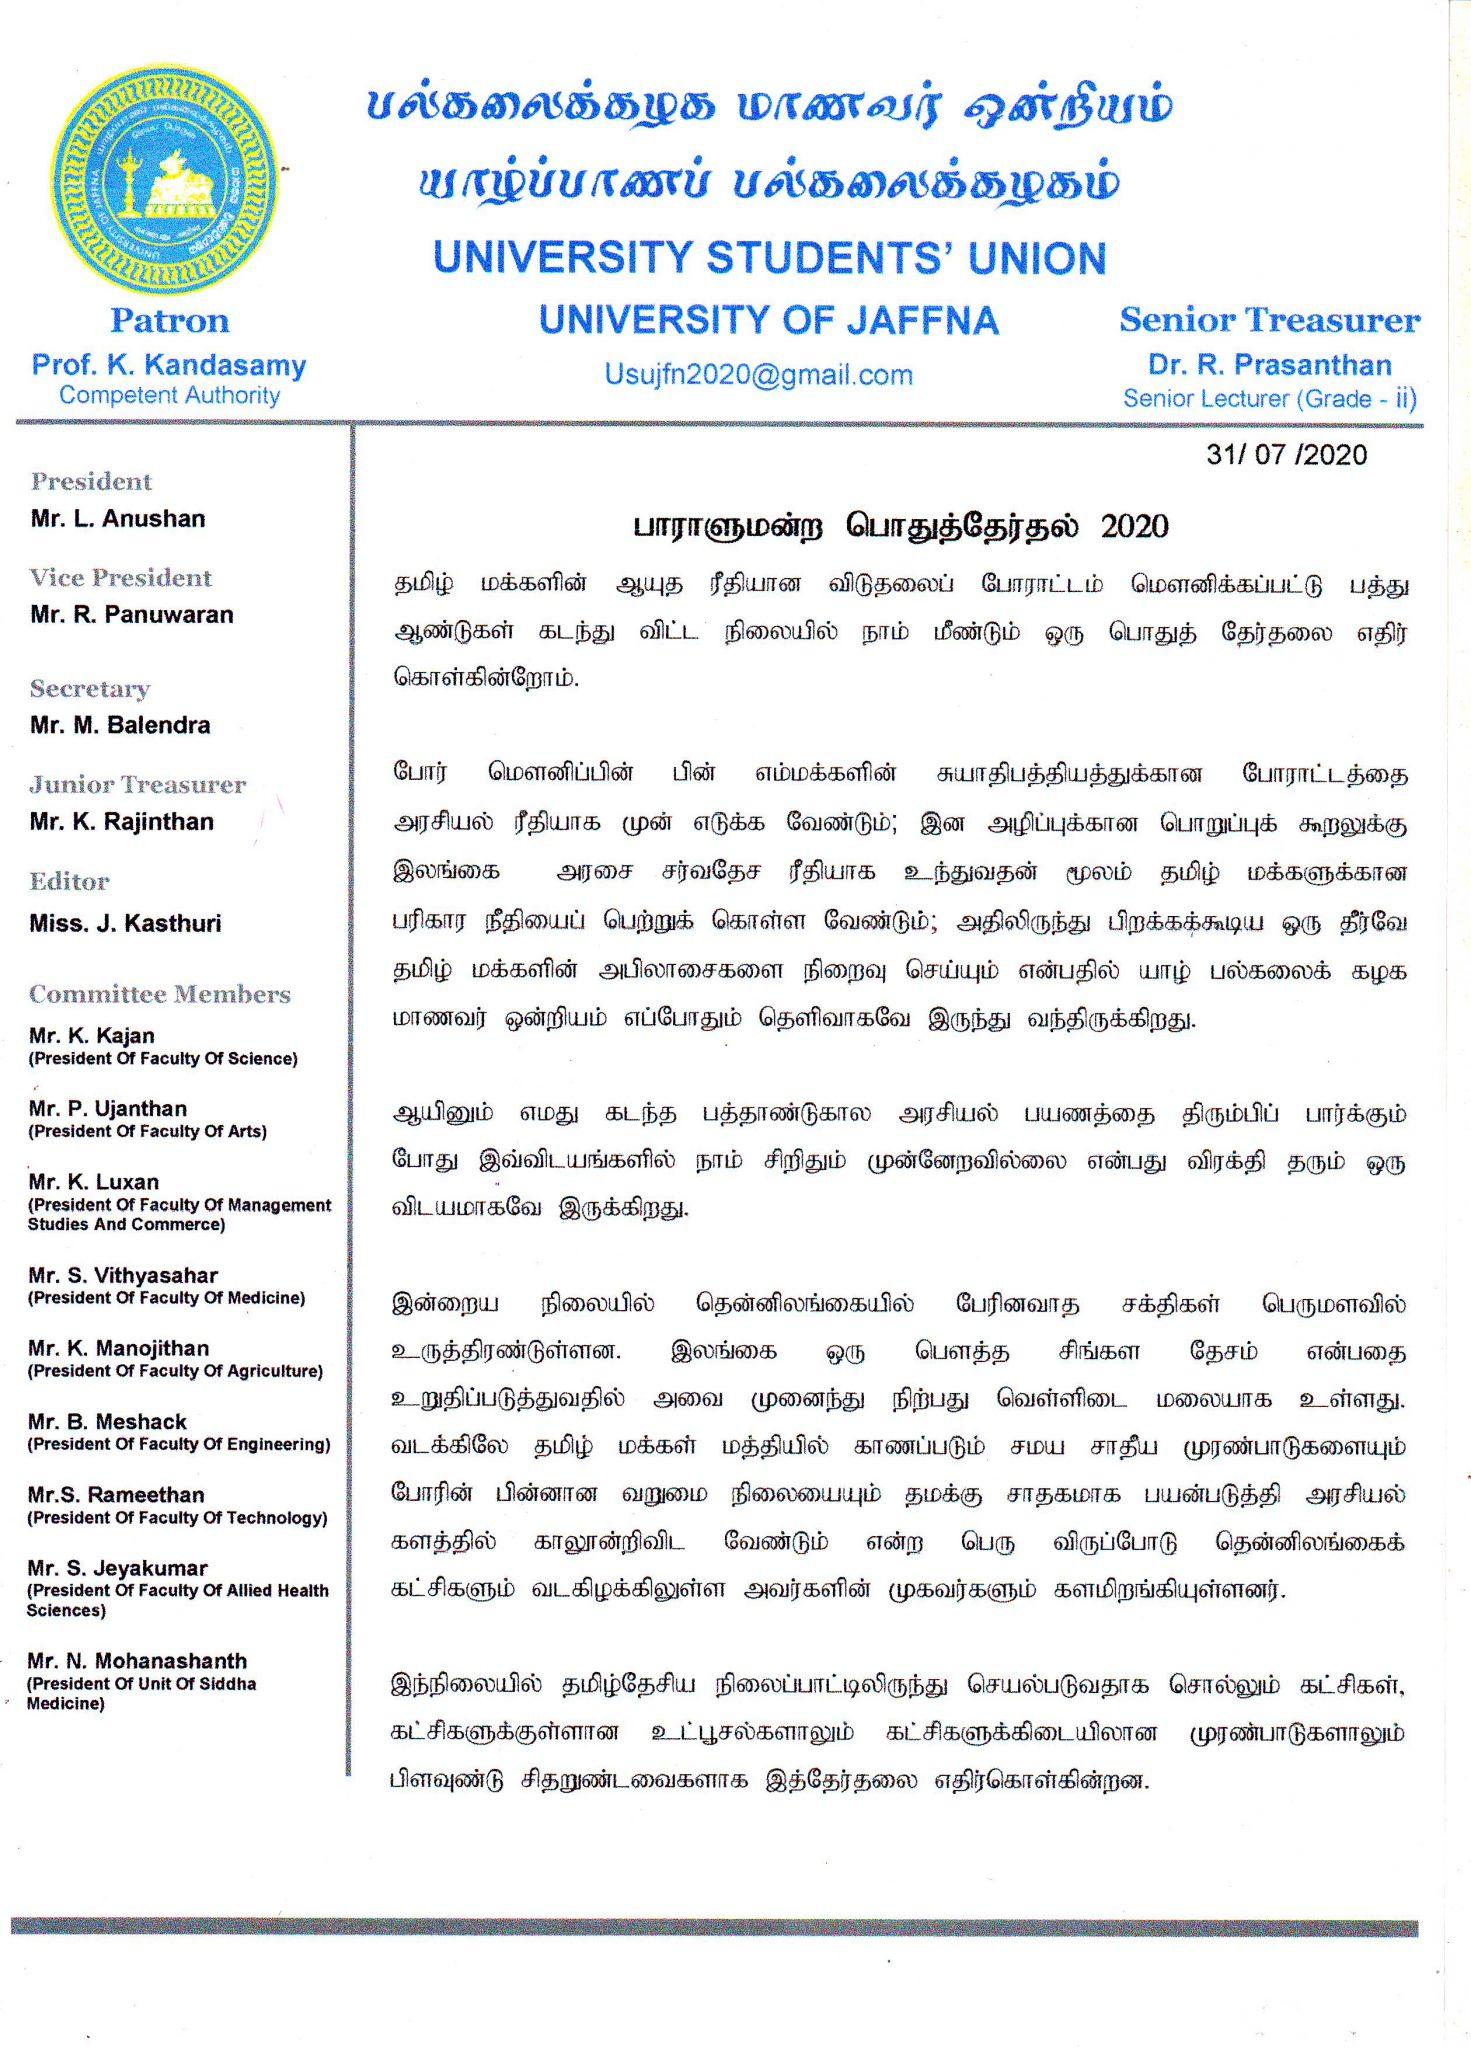 Jaffna-University-Student-Union-Report-Parliament-Election-2020-1-1471x2048